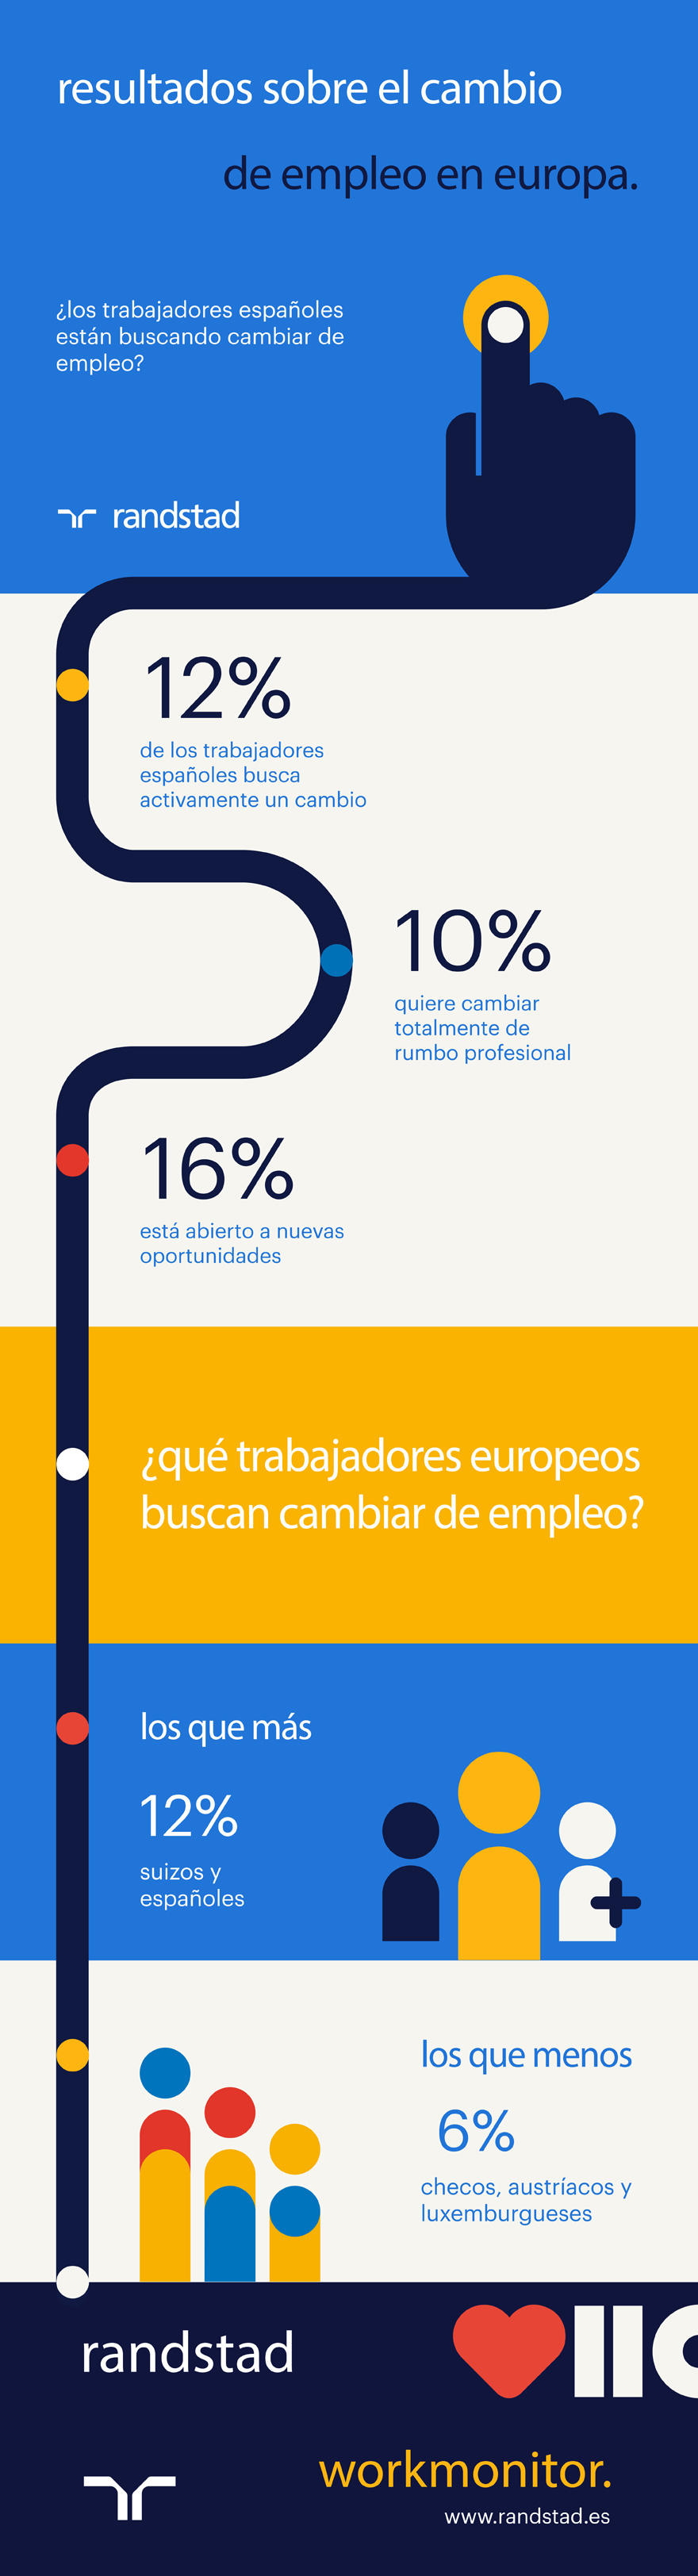 infografía Cambio de Empleo en Europa | Randstad Workmonitor | Q3 2017